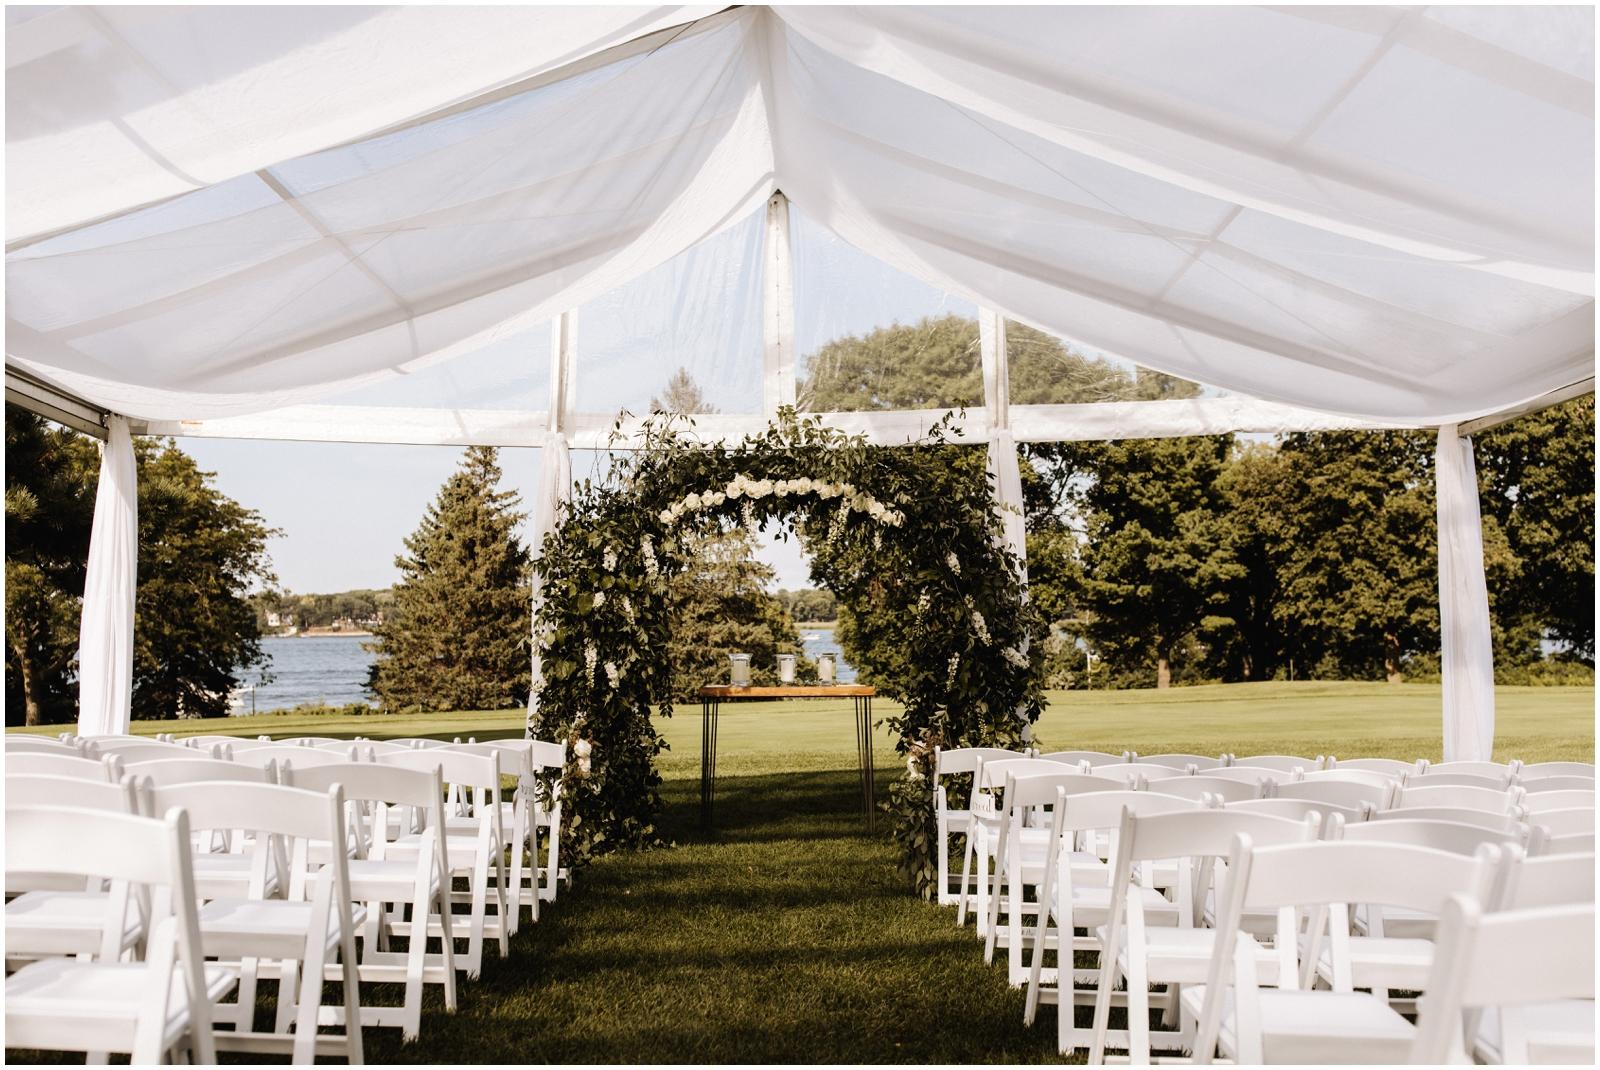 Minnesota Wedding Planner. Lafayette Club Wedding. Outdoor Tent Wedding Ceremony